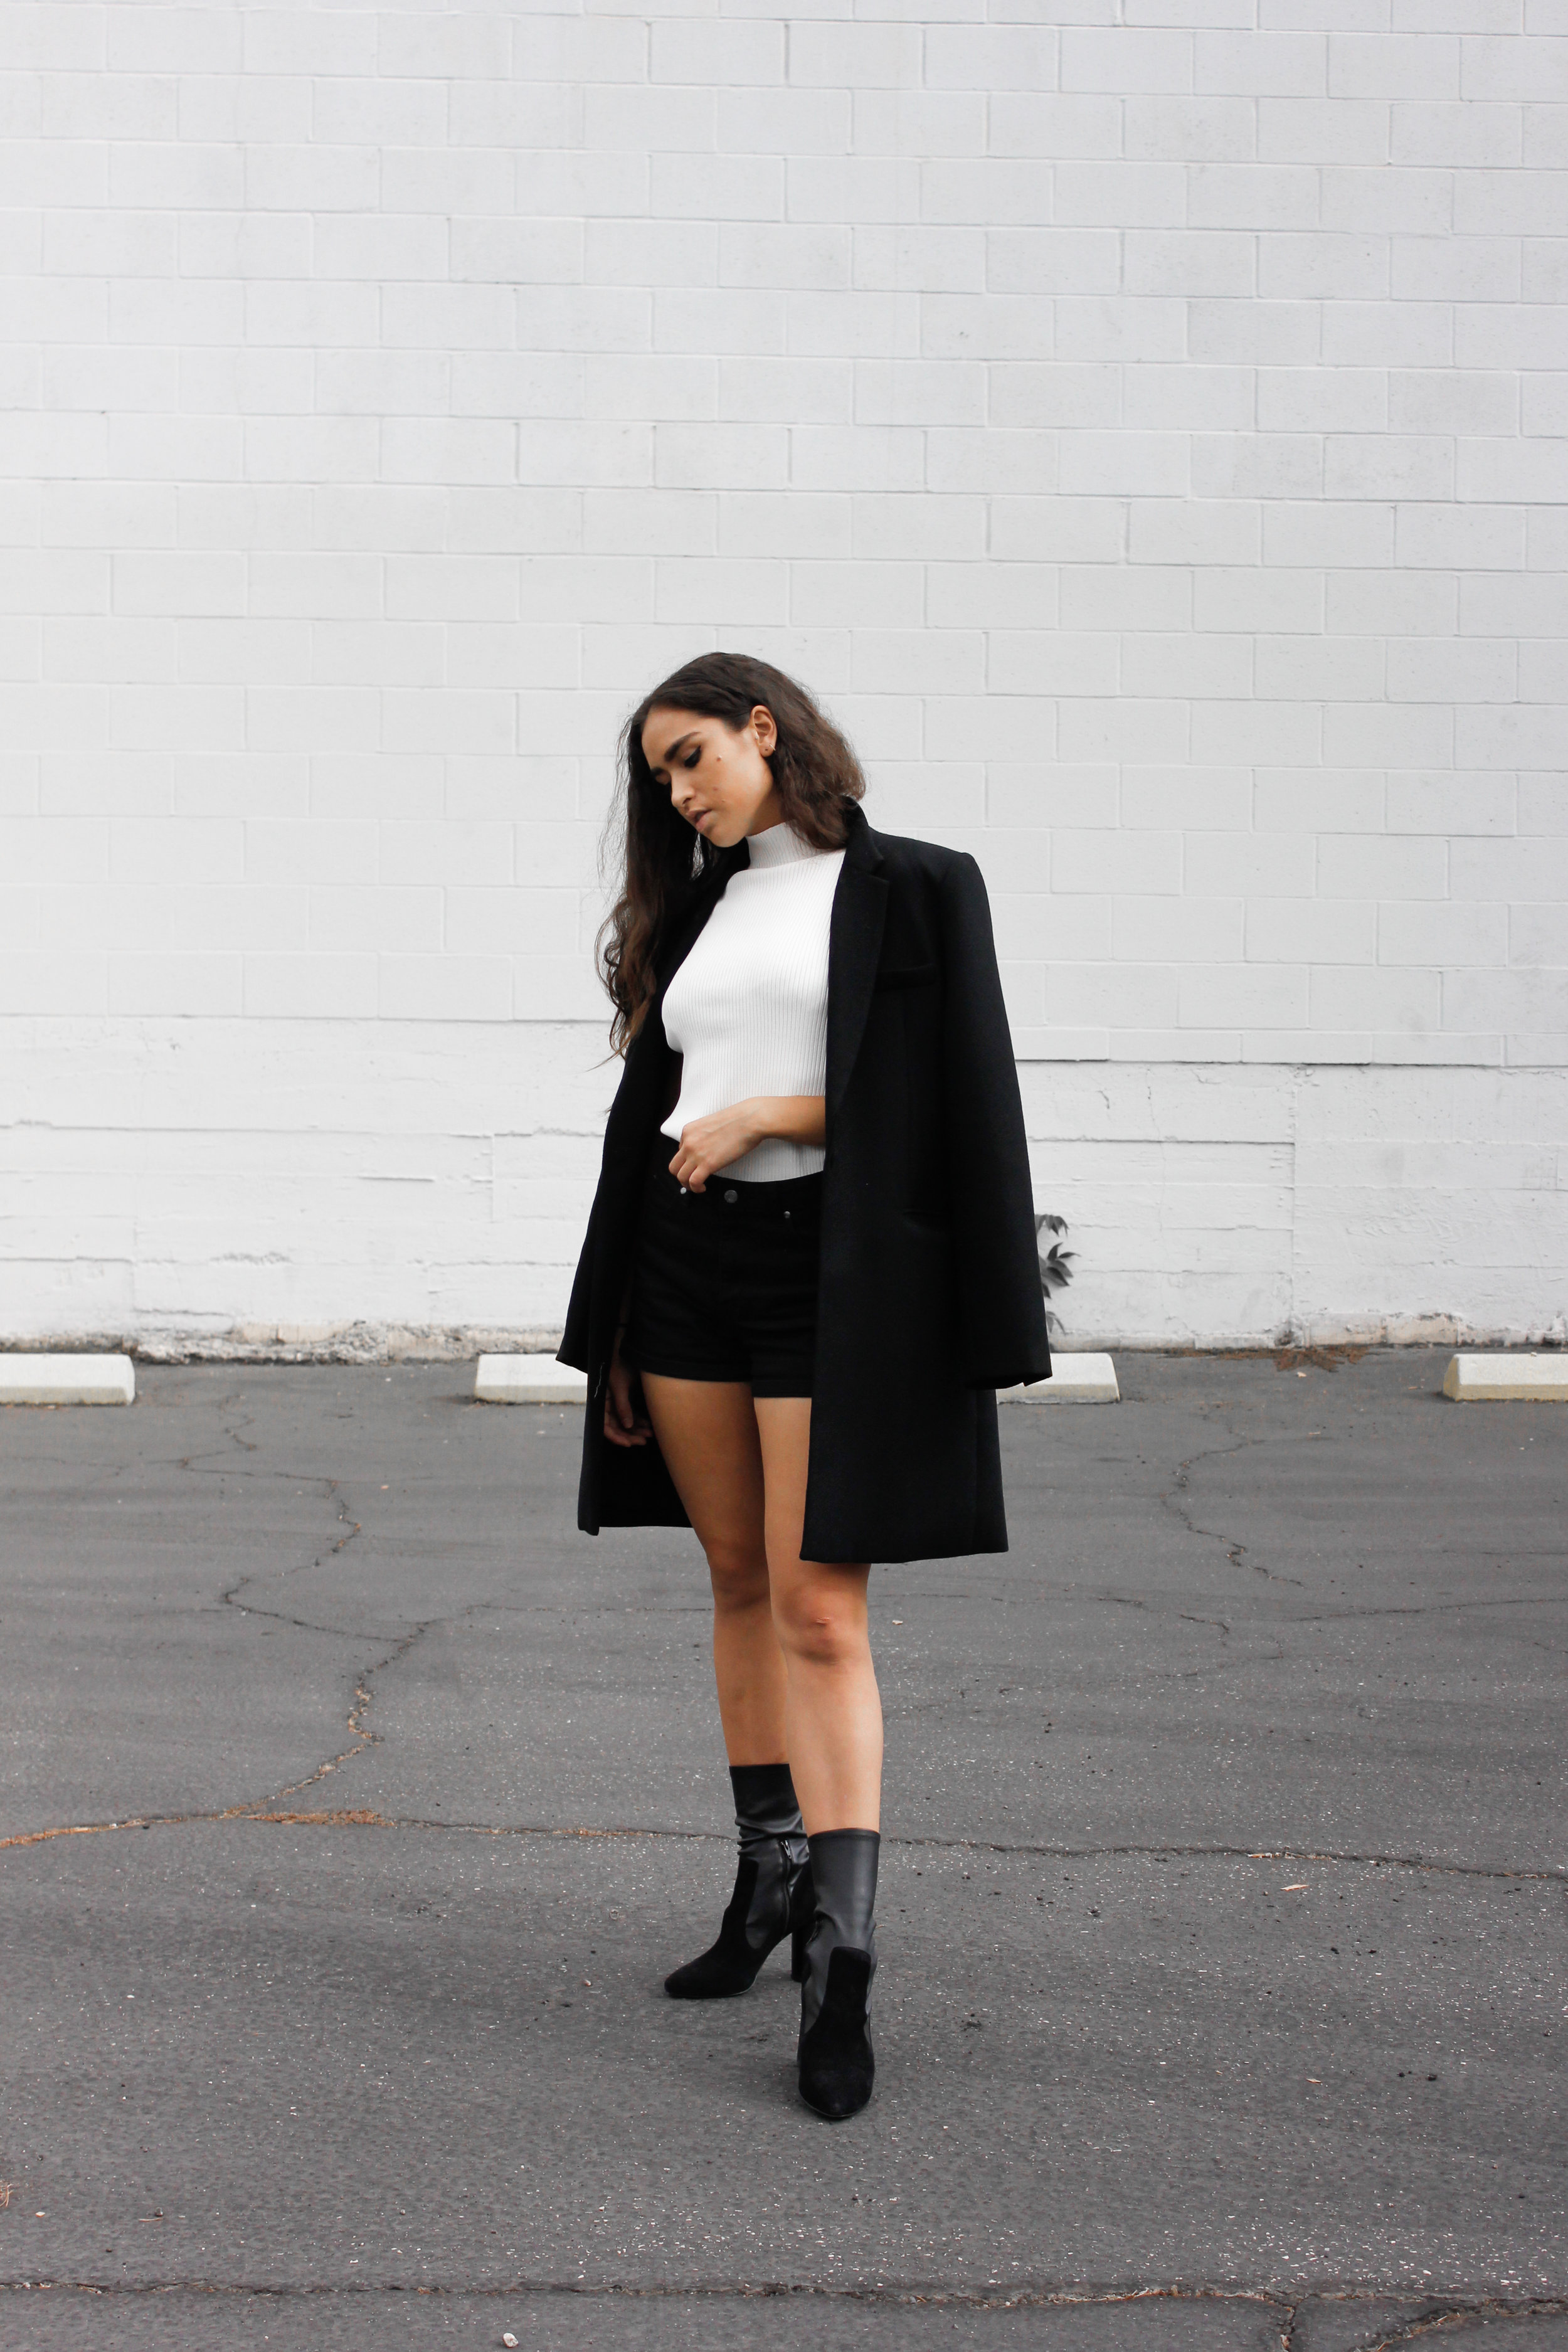 caitlin_miyako_taylor_reformation_coat_zara_knit_top_aldo_boots